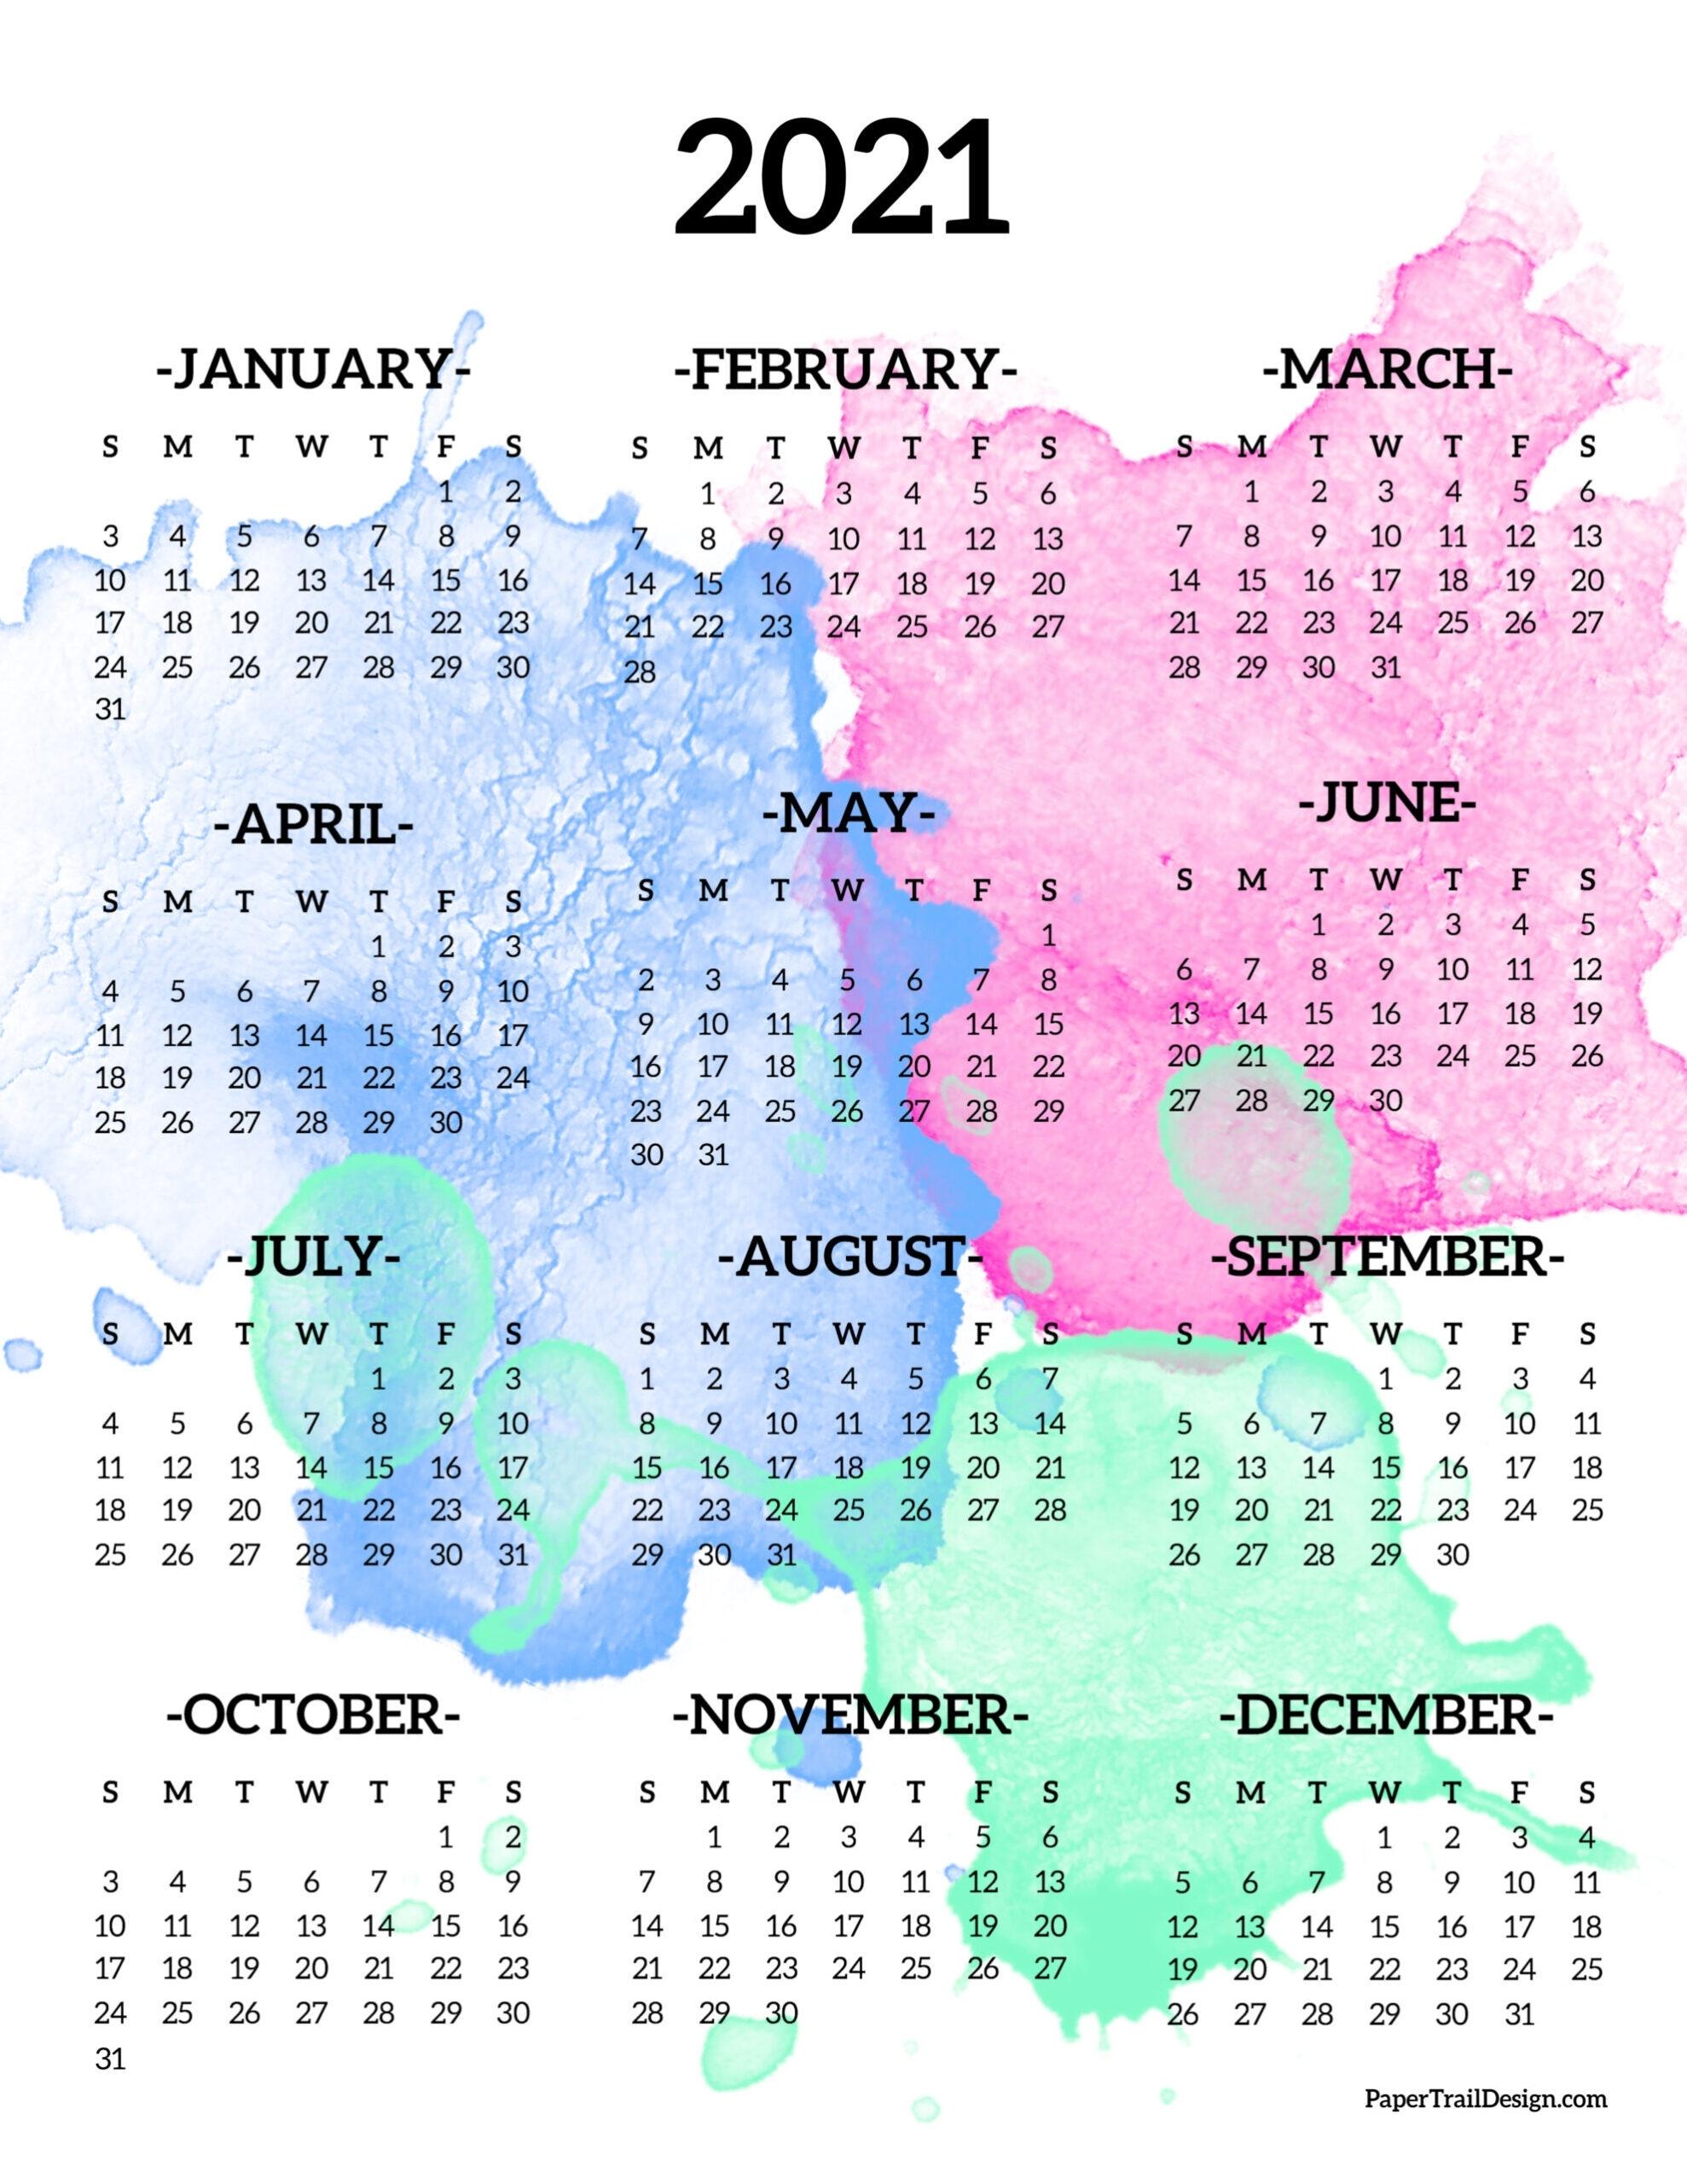 2021 Year At A Glance Calendar 2021 Free Printable